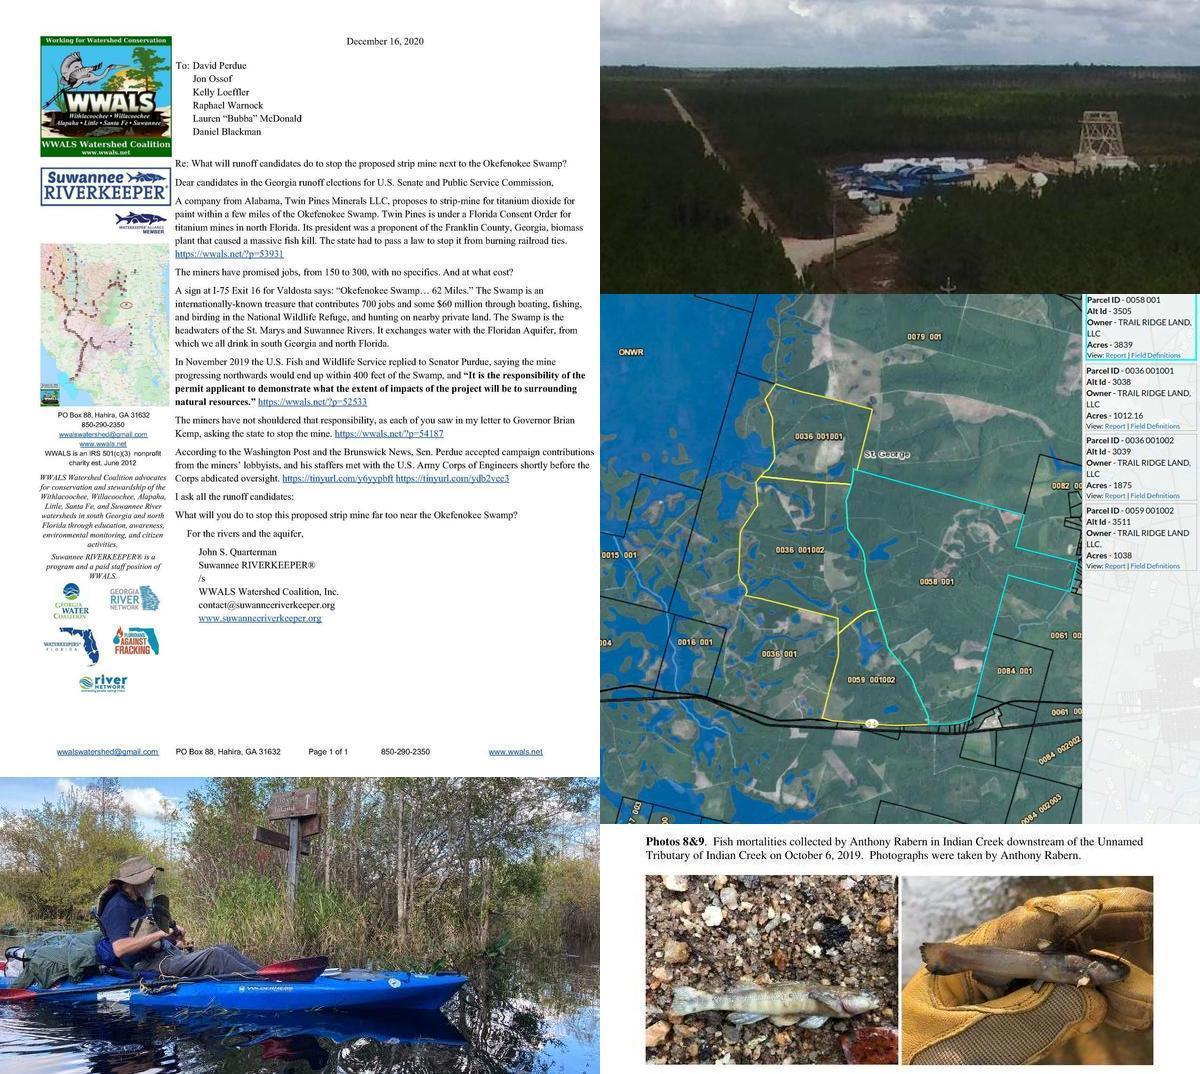 [Letter, Suwannee Riverkeeper, mine site, Okefenokee Swamp, fish kill]